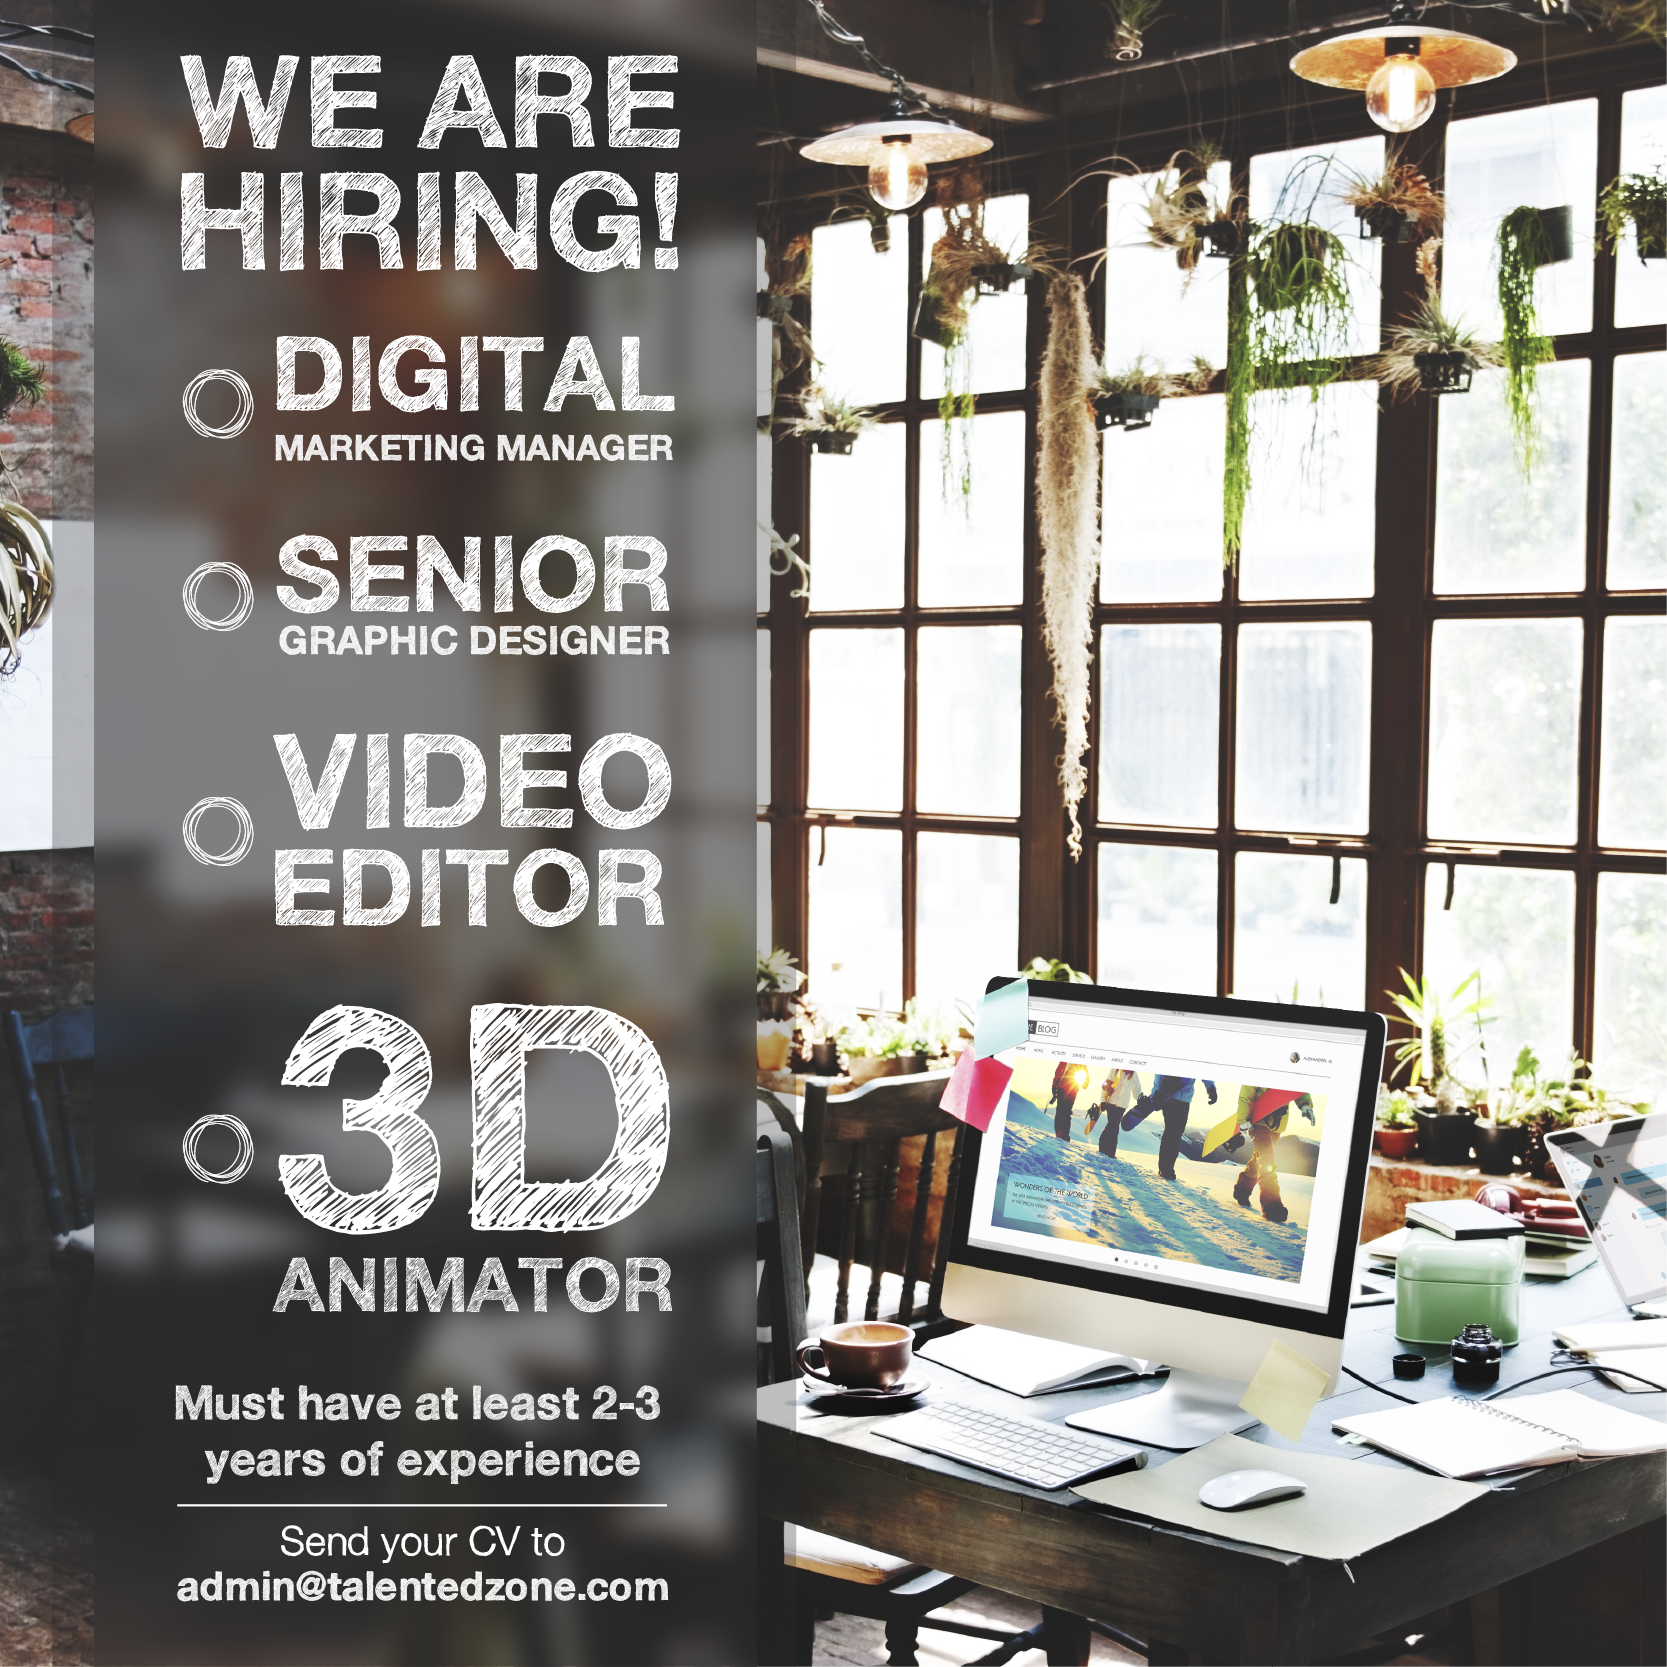 Open Vacancies In Uae We Are Looking For Digital Marketing